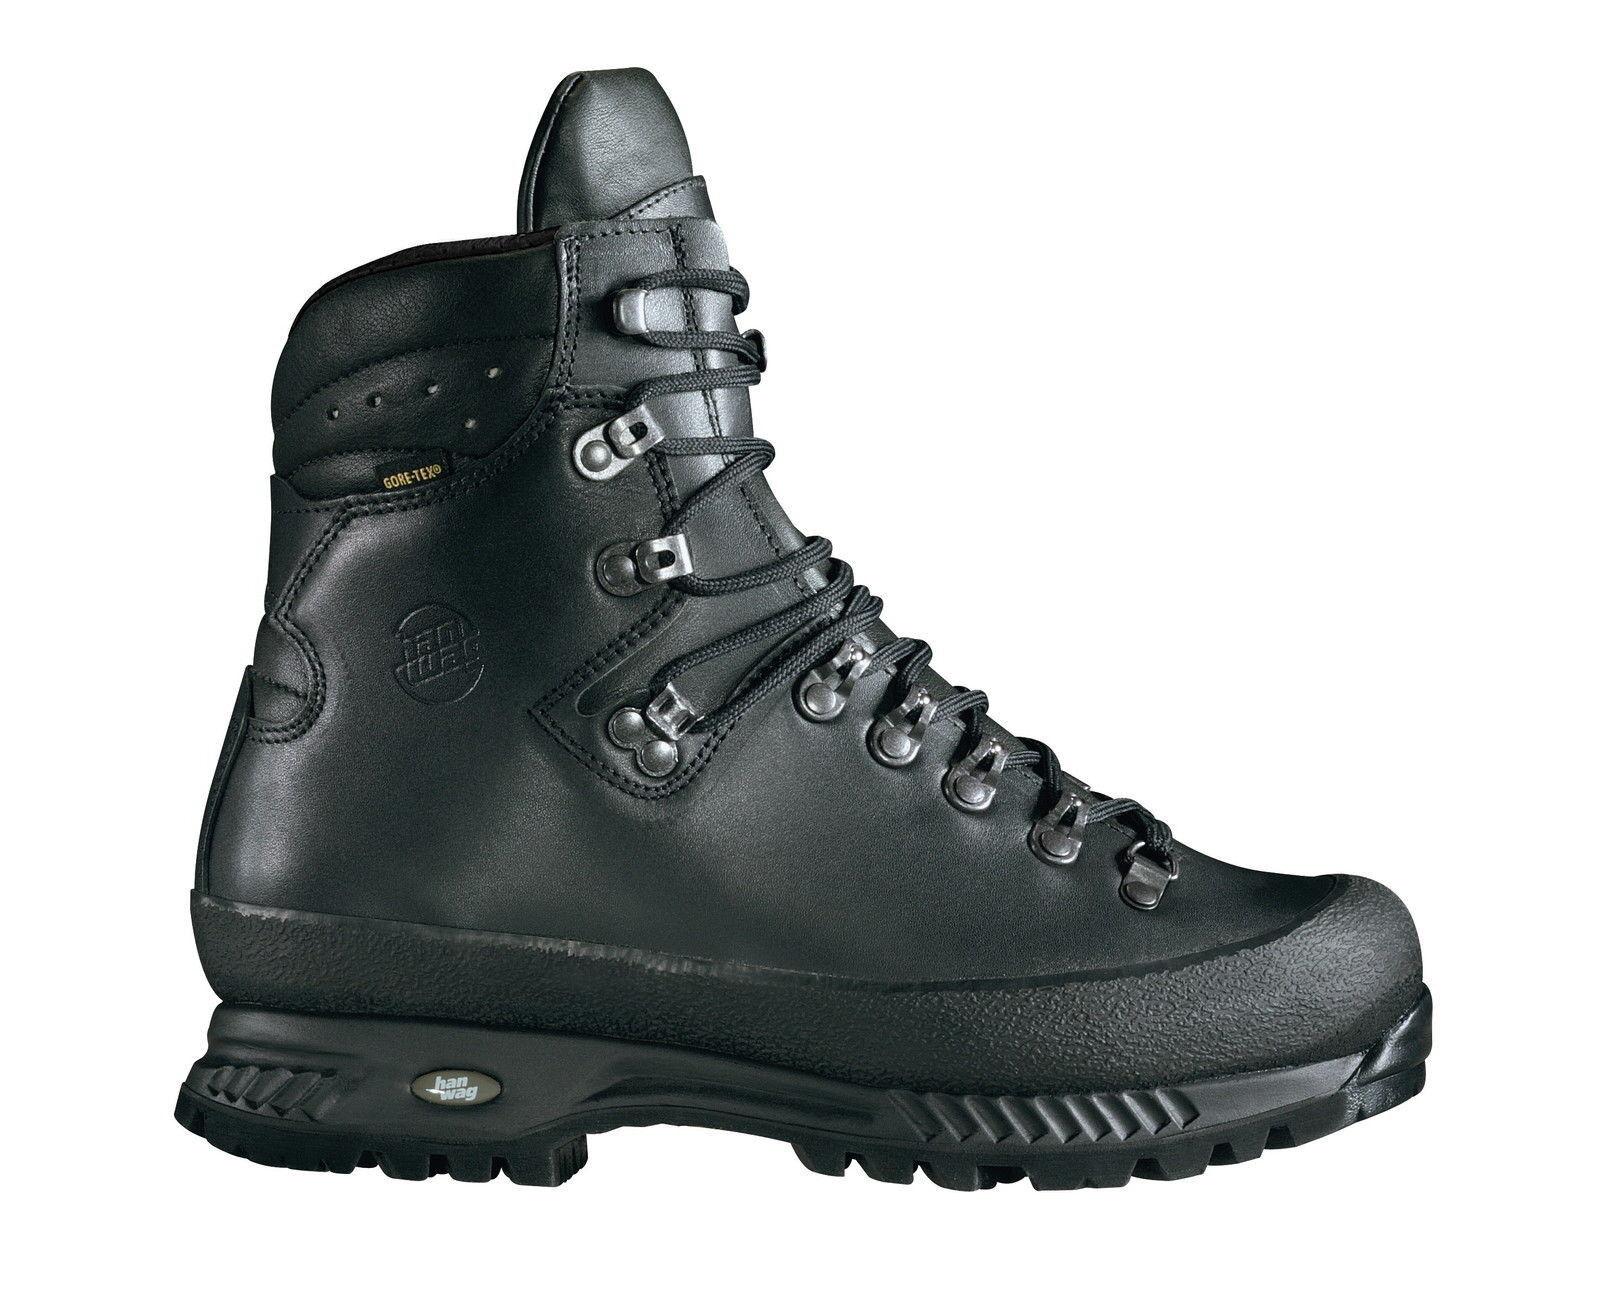 Hanwag Bergschuhe:Alaska GTX Men 12 Größe 12 Men - 47  schwarz 5725b7